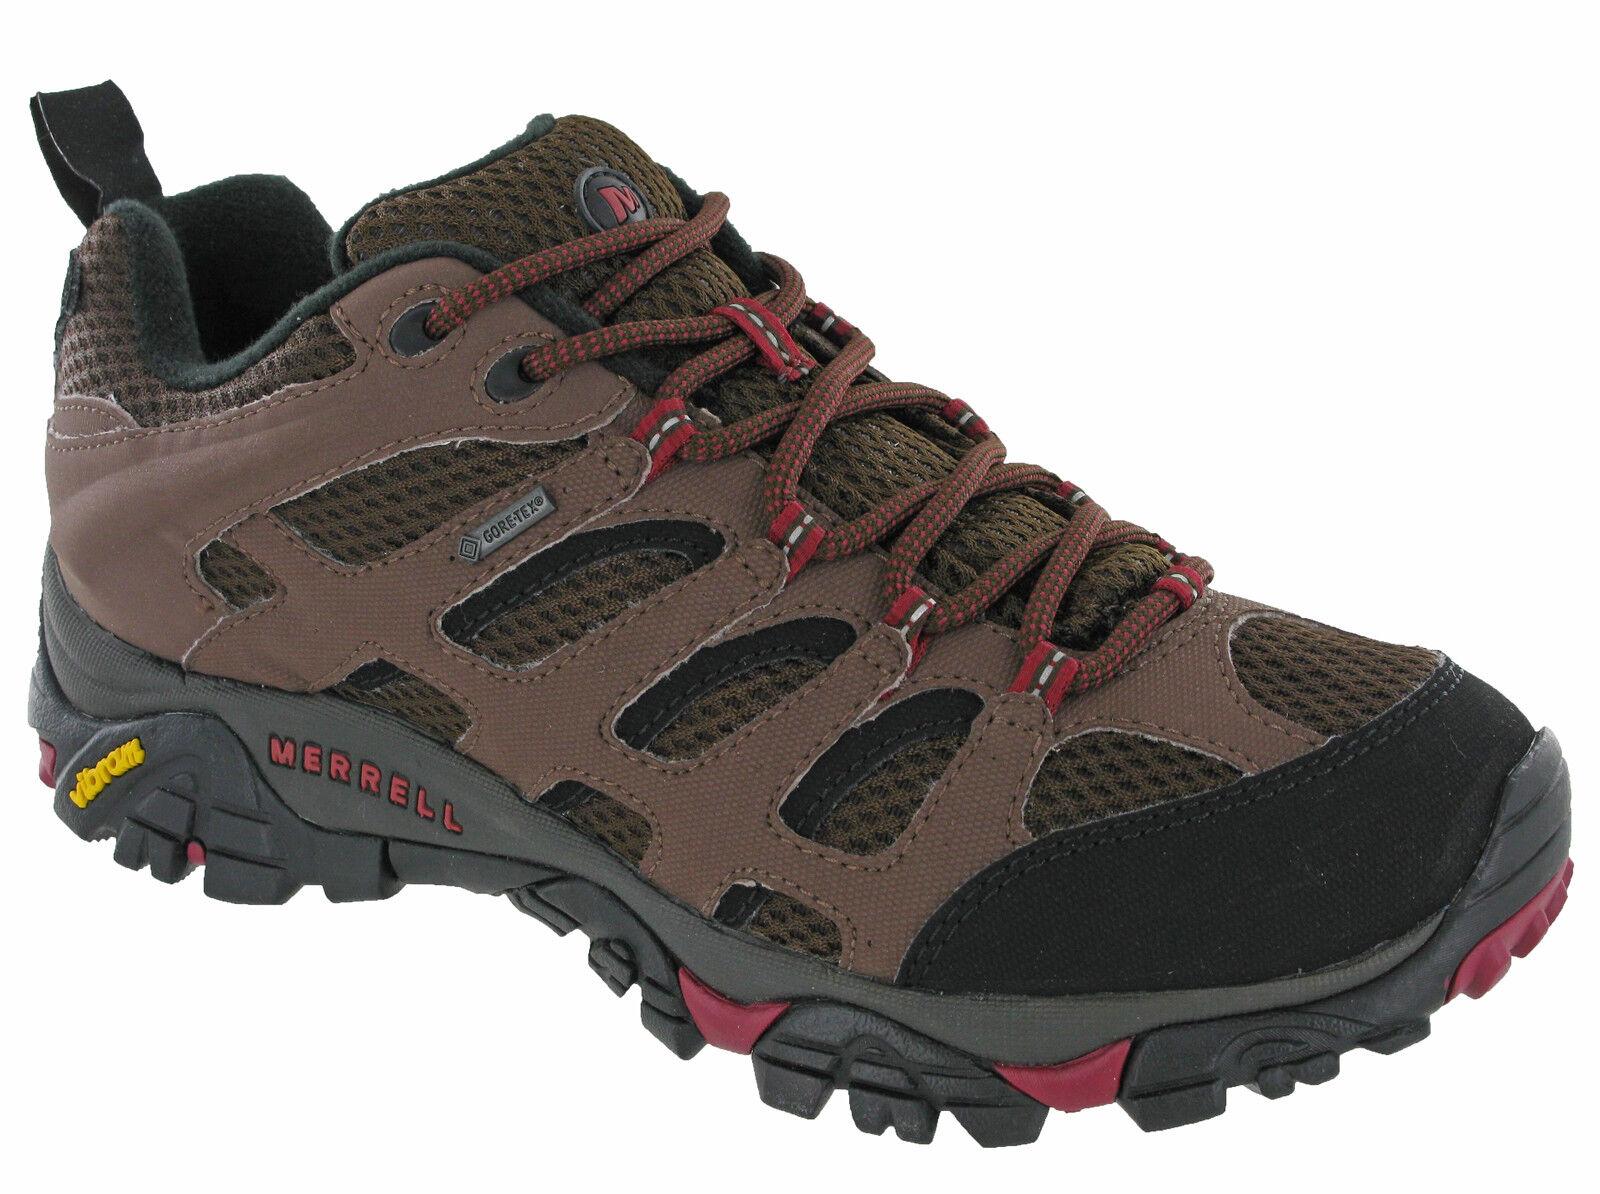 Merrell Moab Gore-tex Walking Trekking Trainers Mens Lace Up J32329 Potting Soil